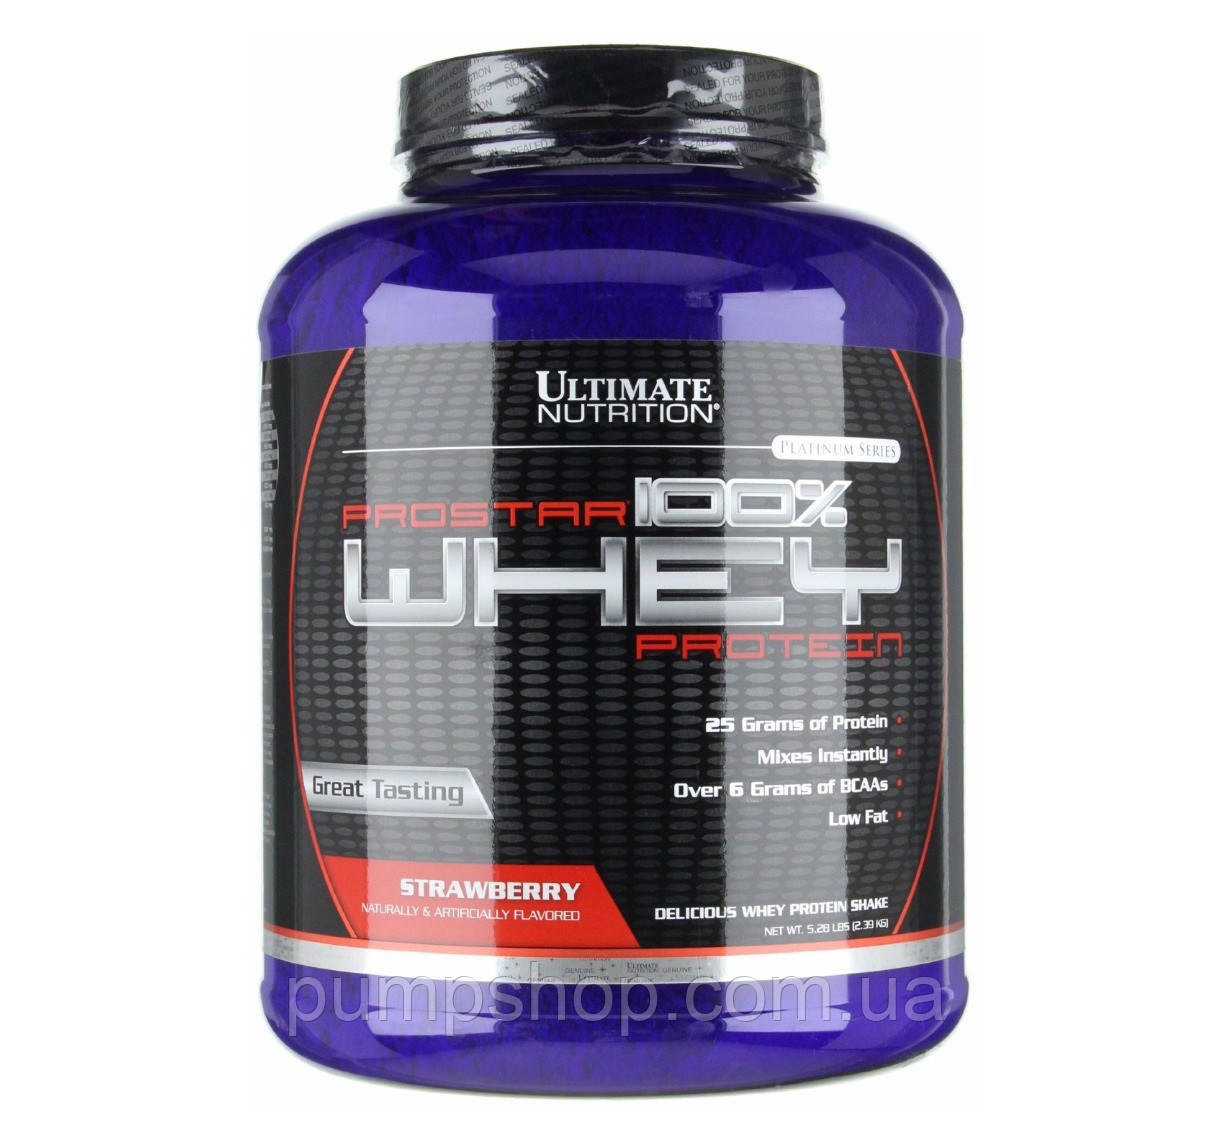 Протеин изолят Ultimate Nutrition ProStar 100% Whey Protein 2,36 кг